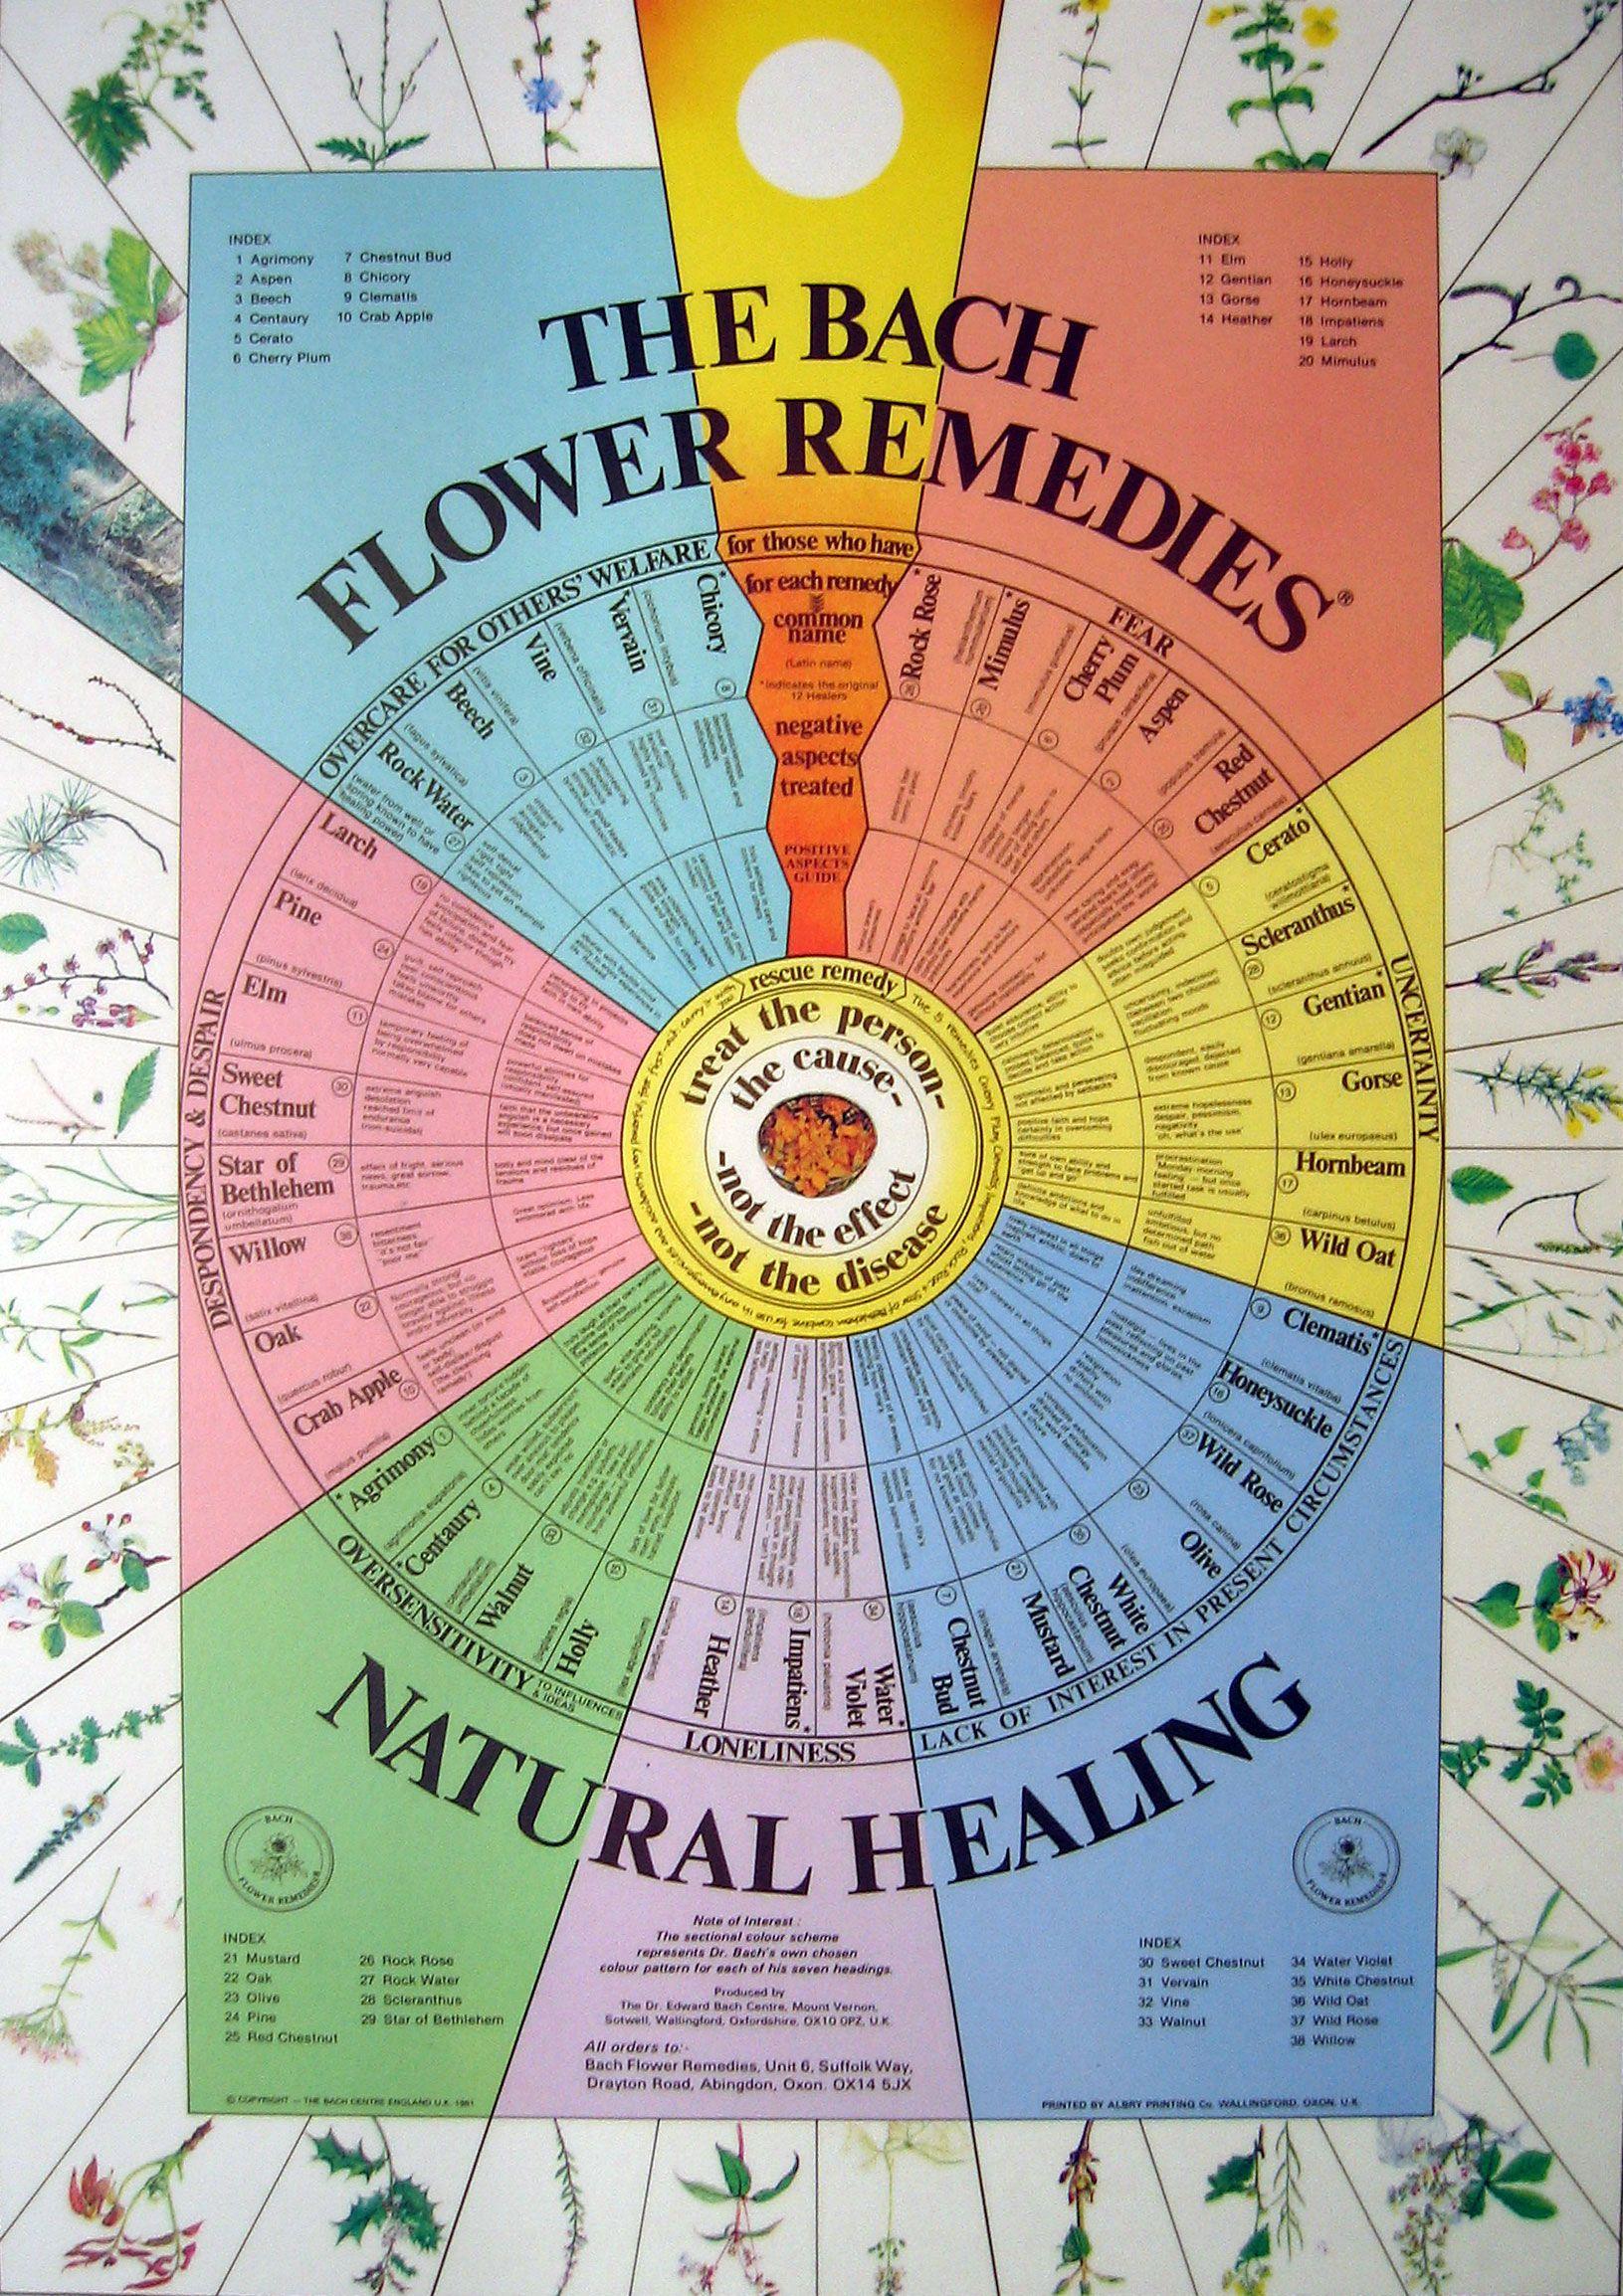 The Bach Flower Remedies Natural Healing Bach Flower Remedies Flower Remedy Flower Essences Remedies